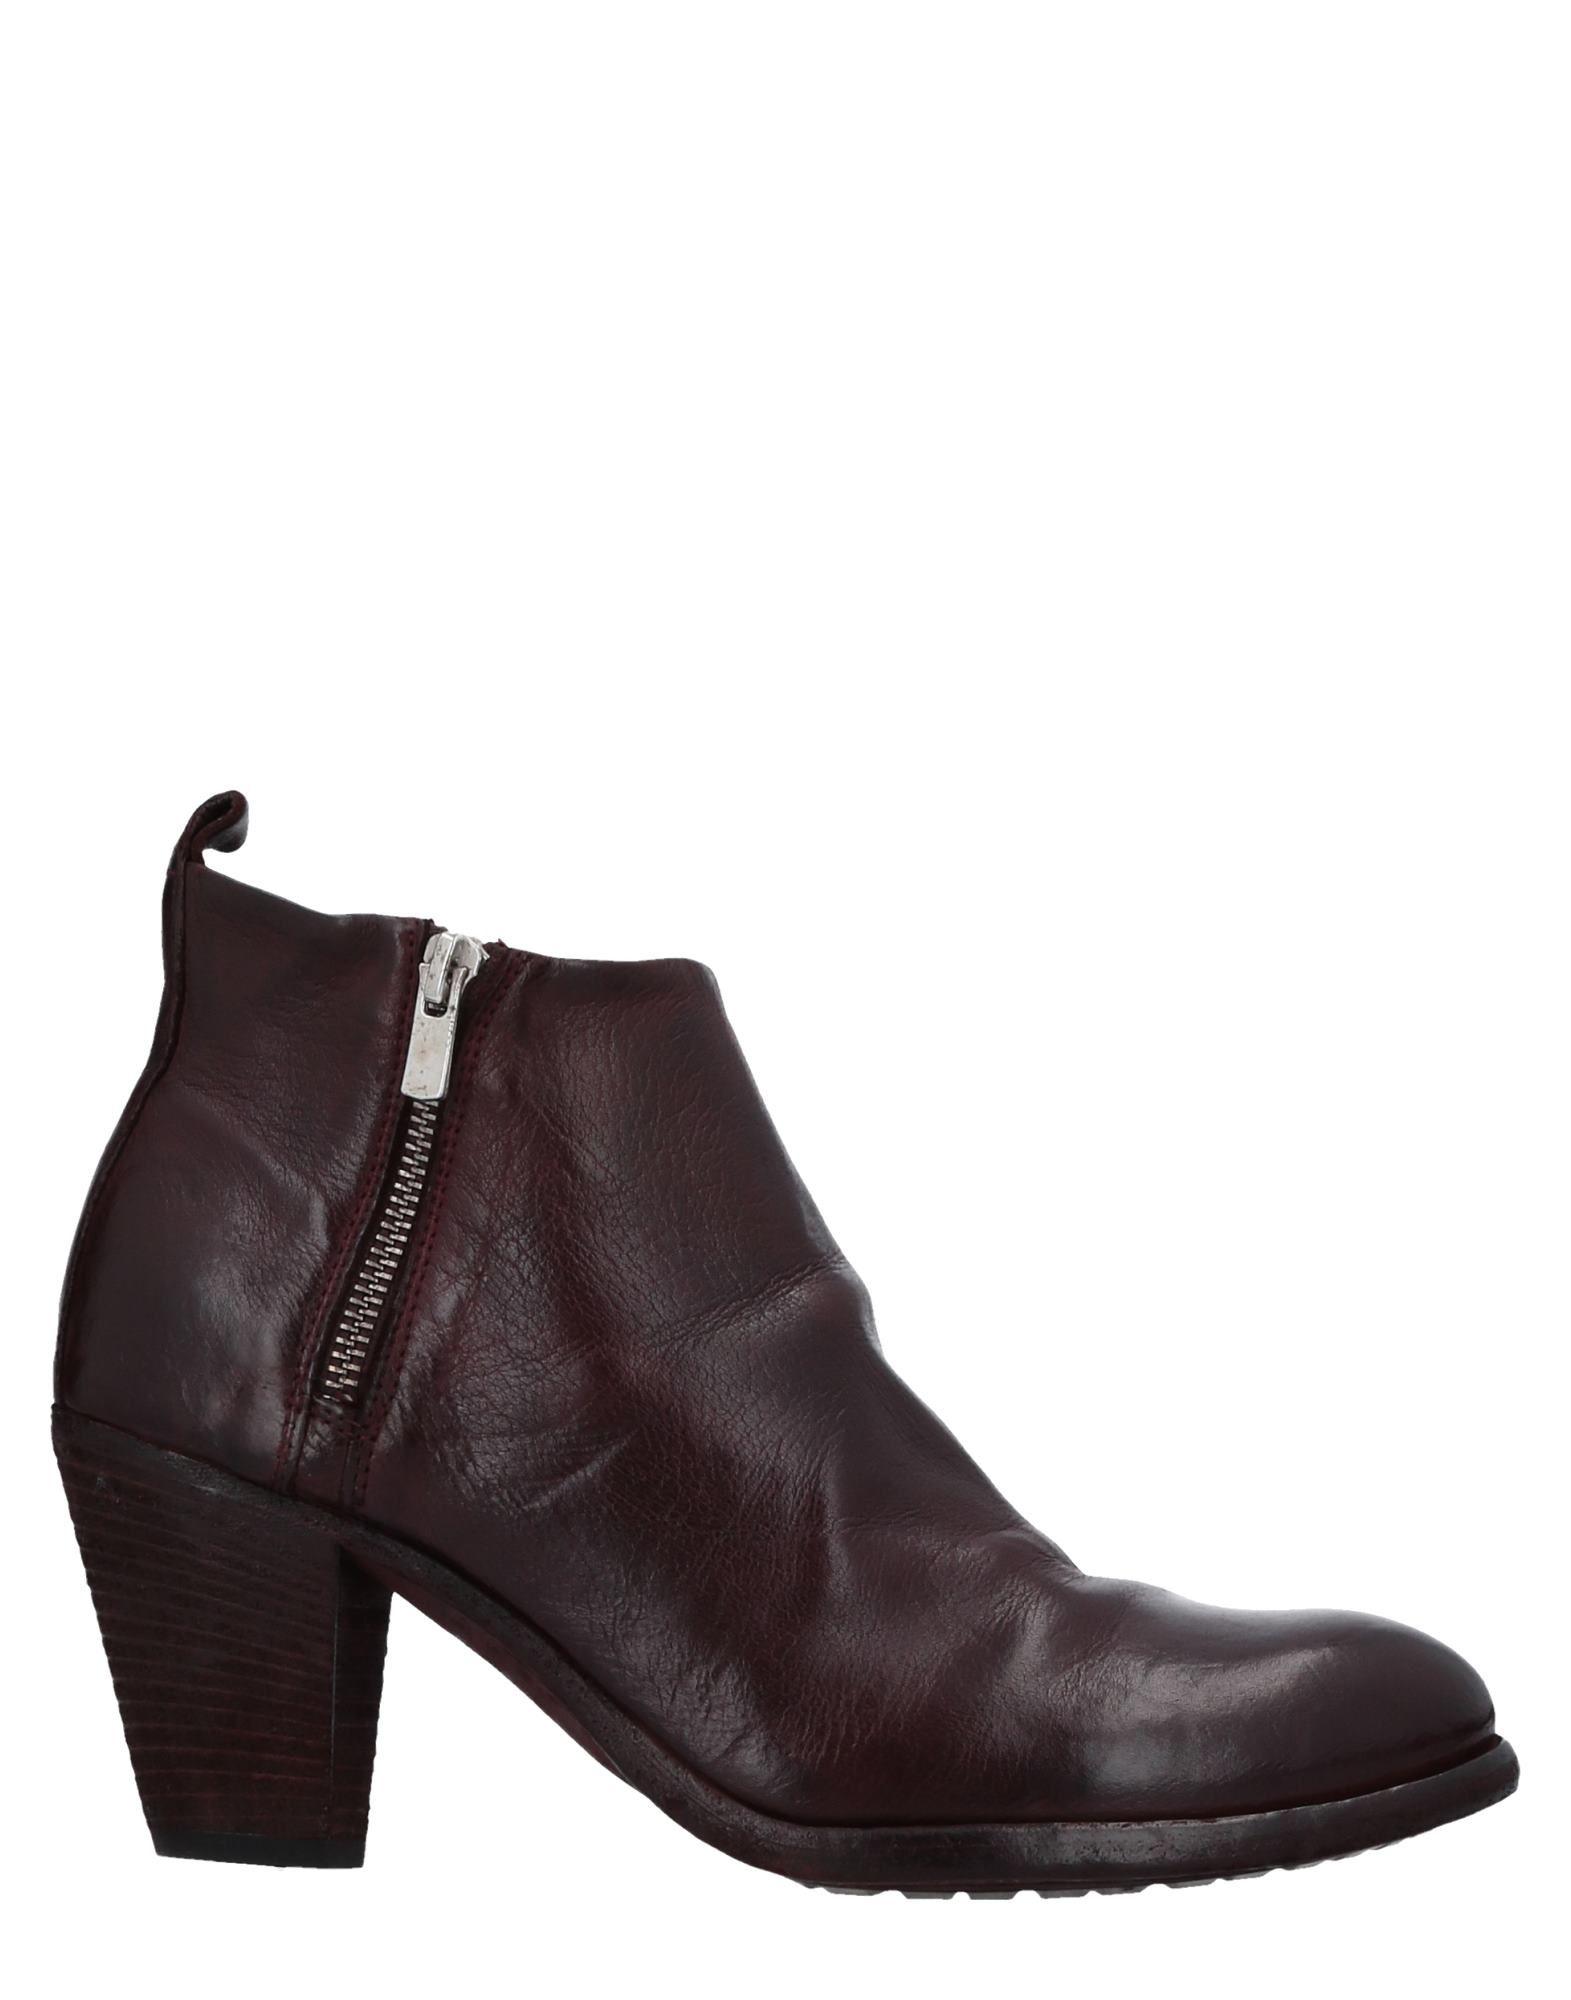 Rabatt Schuhe Officine Creative Italia Stiefelette Damen  11513303UR